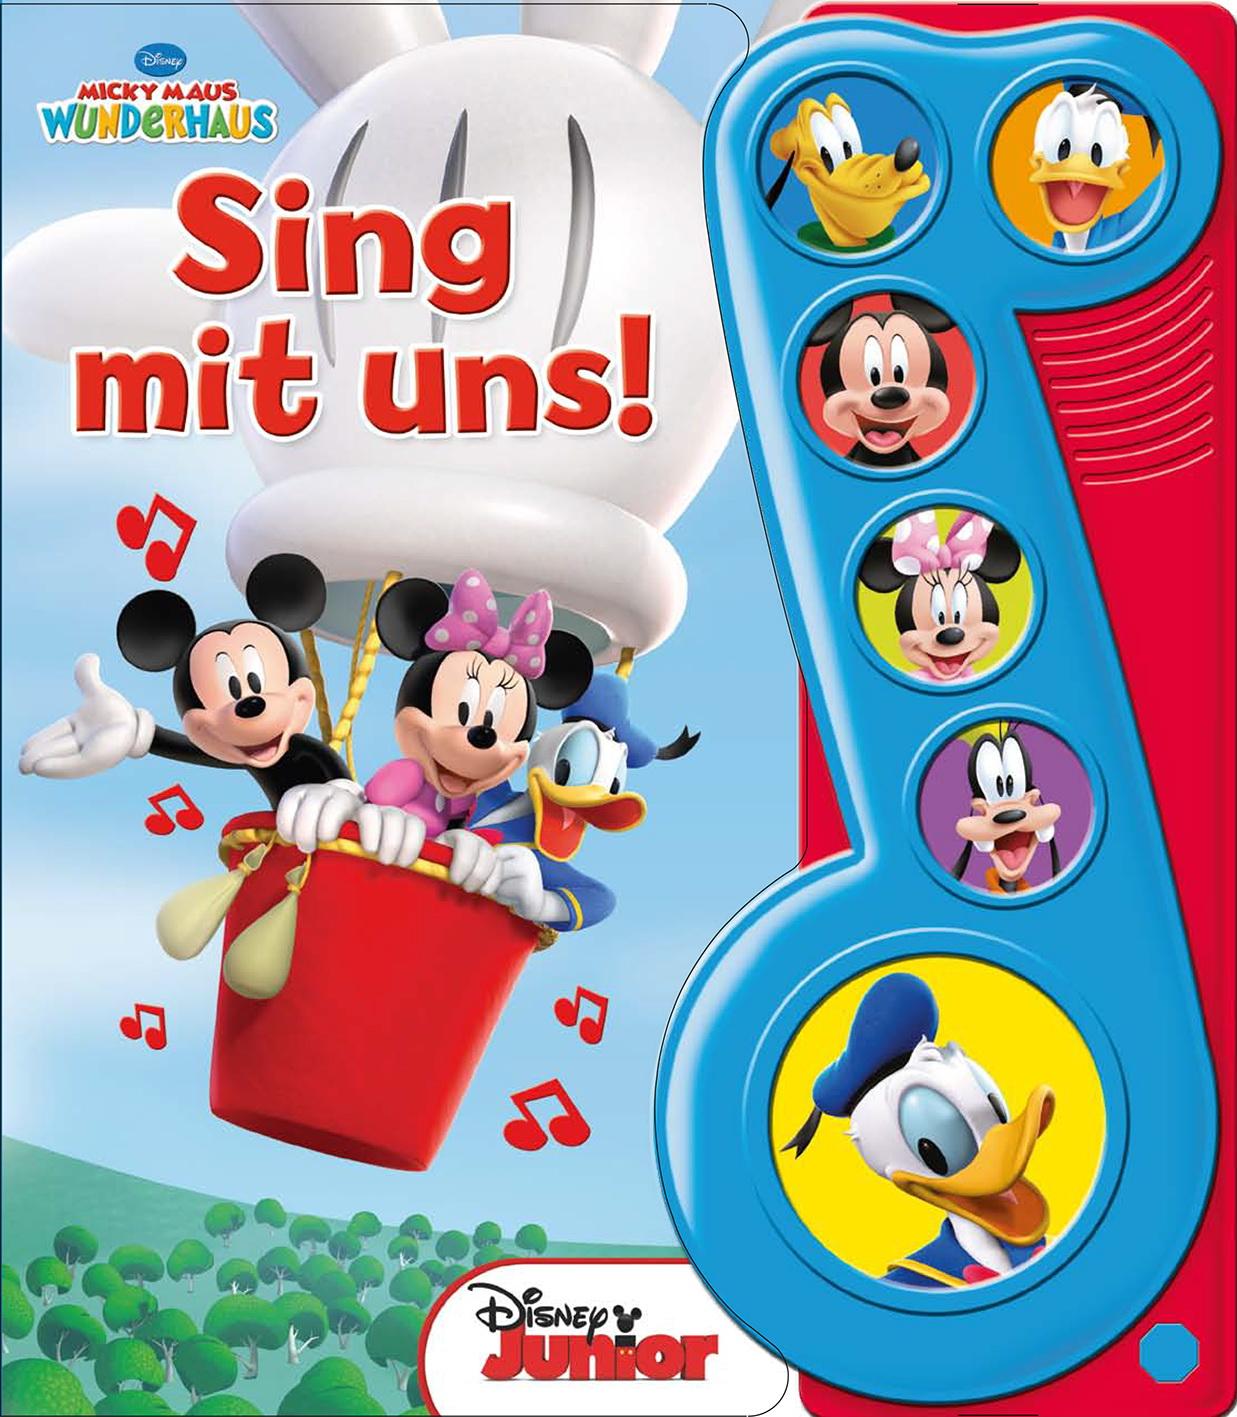 Walt Disney / Micky Maus Wunderhaus - Sing Mit Uns, M. Tonmodulen9781450891103